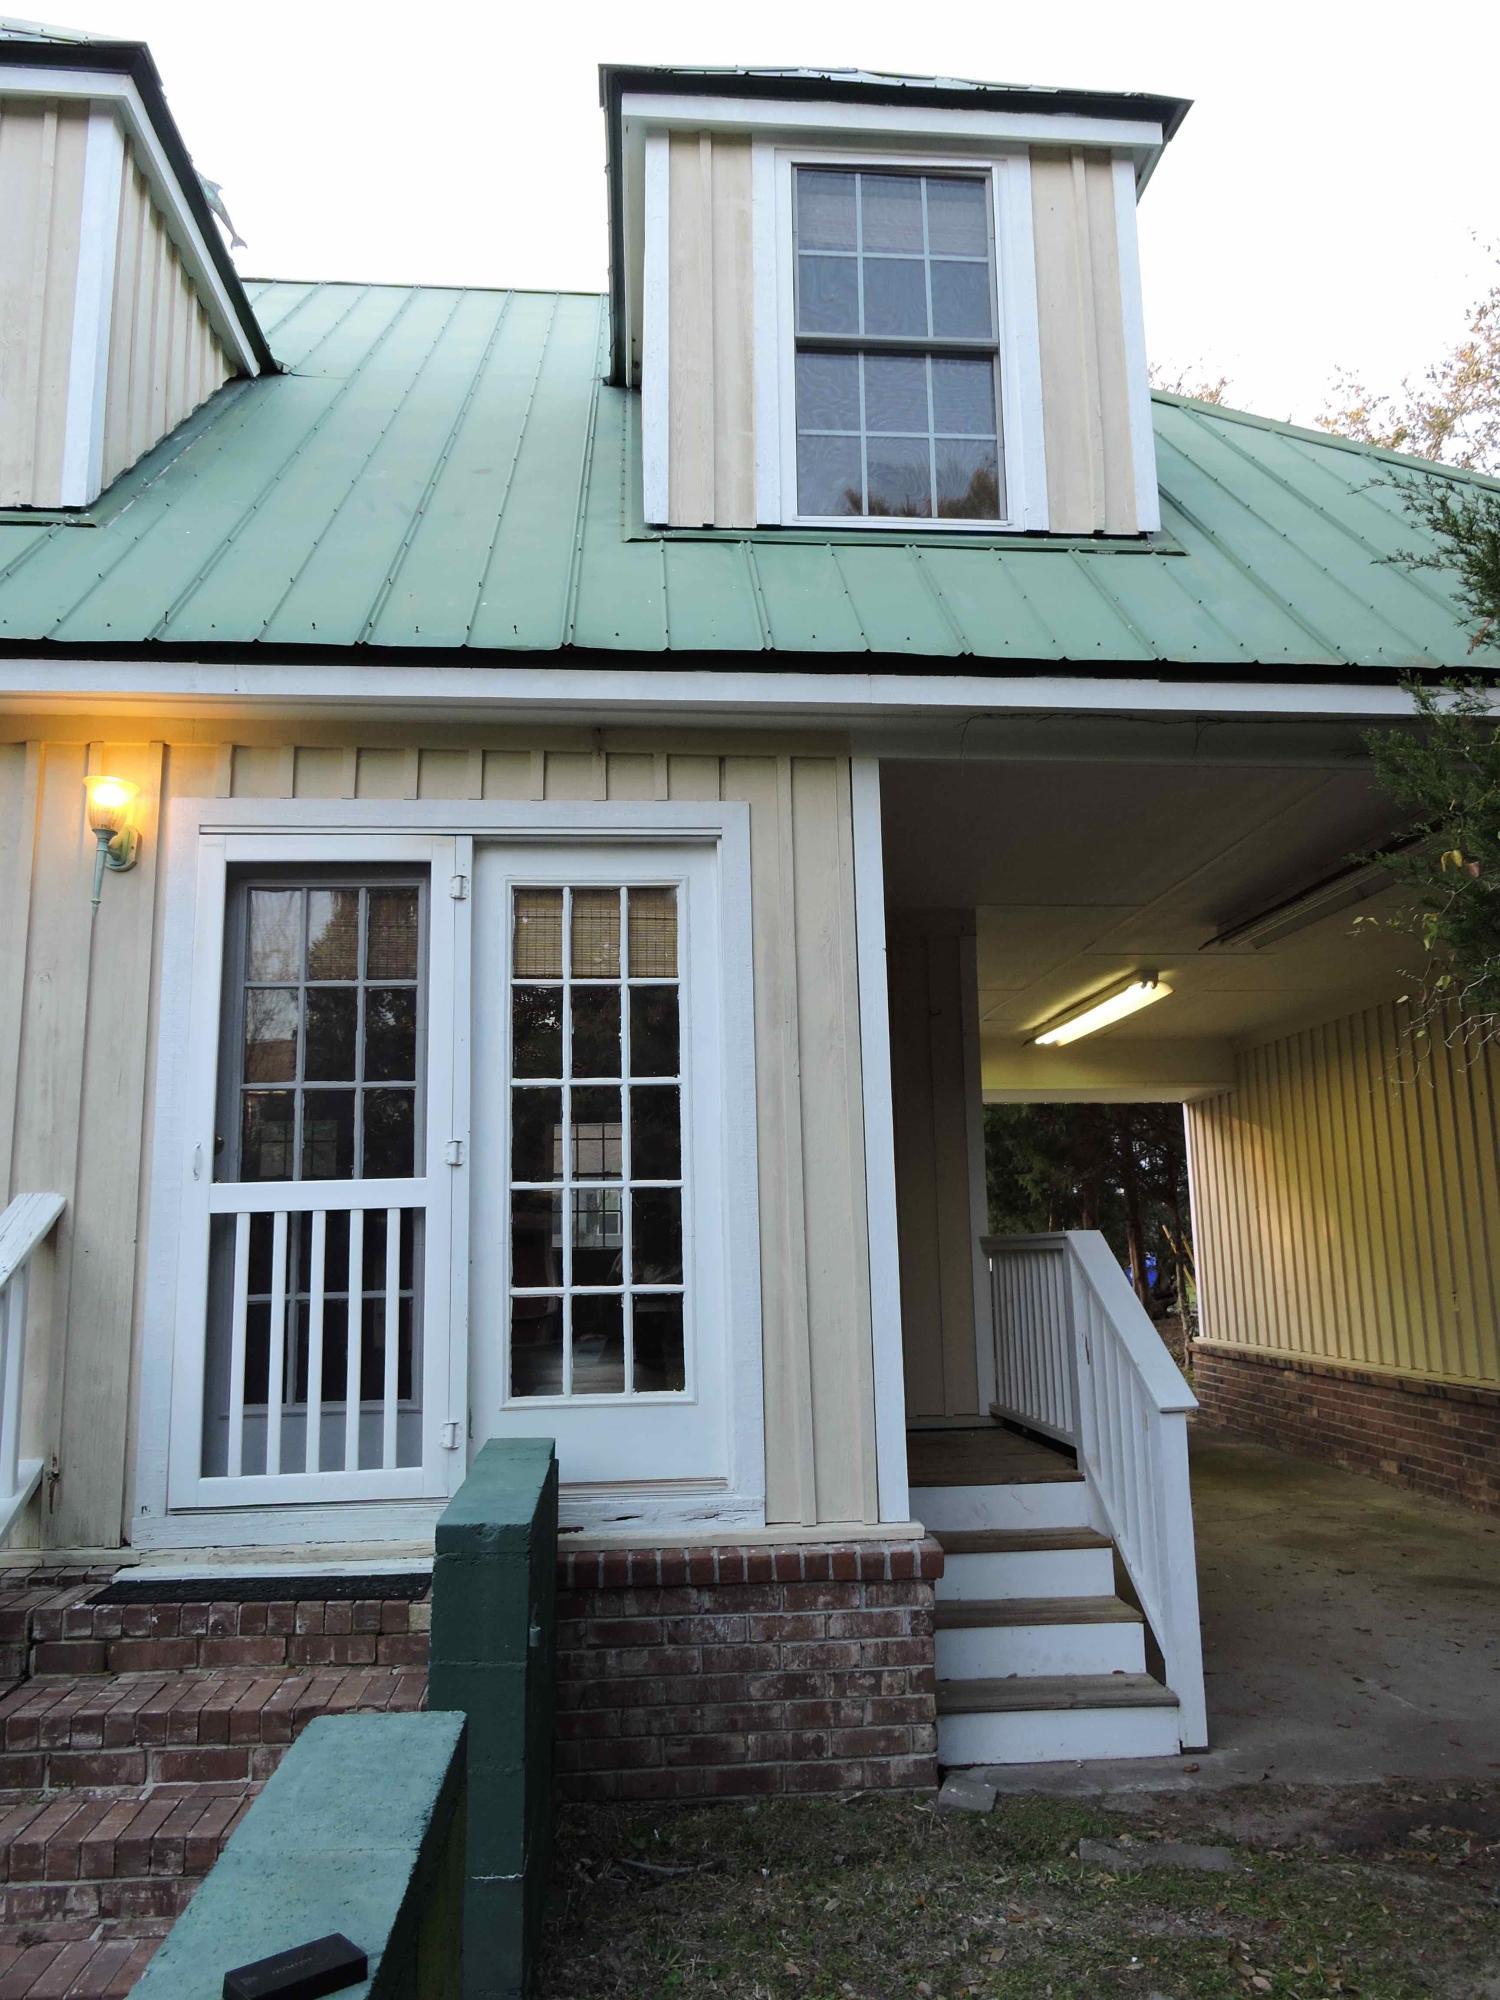 Olde Bridge Homes For Sale - 517 Old Bridge, Mount Pleasant, SC - 17